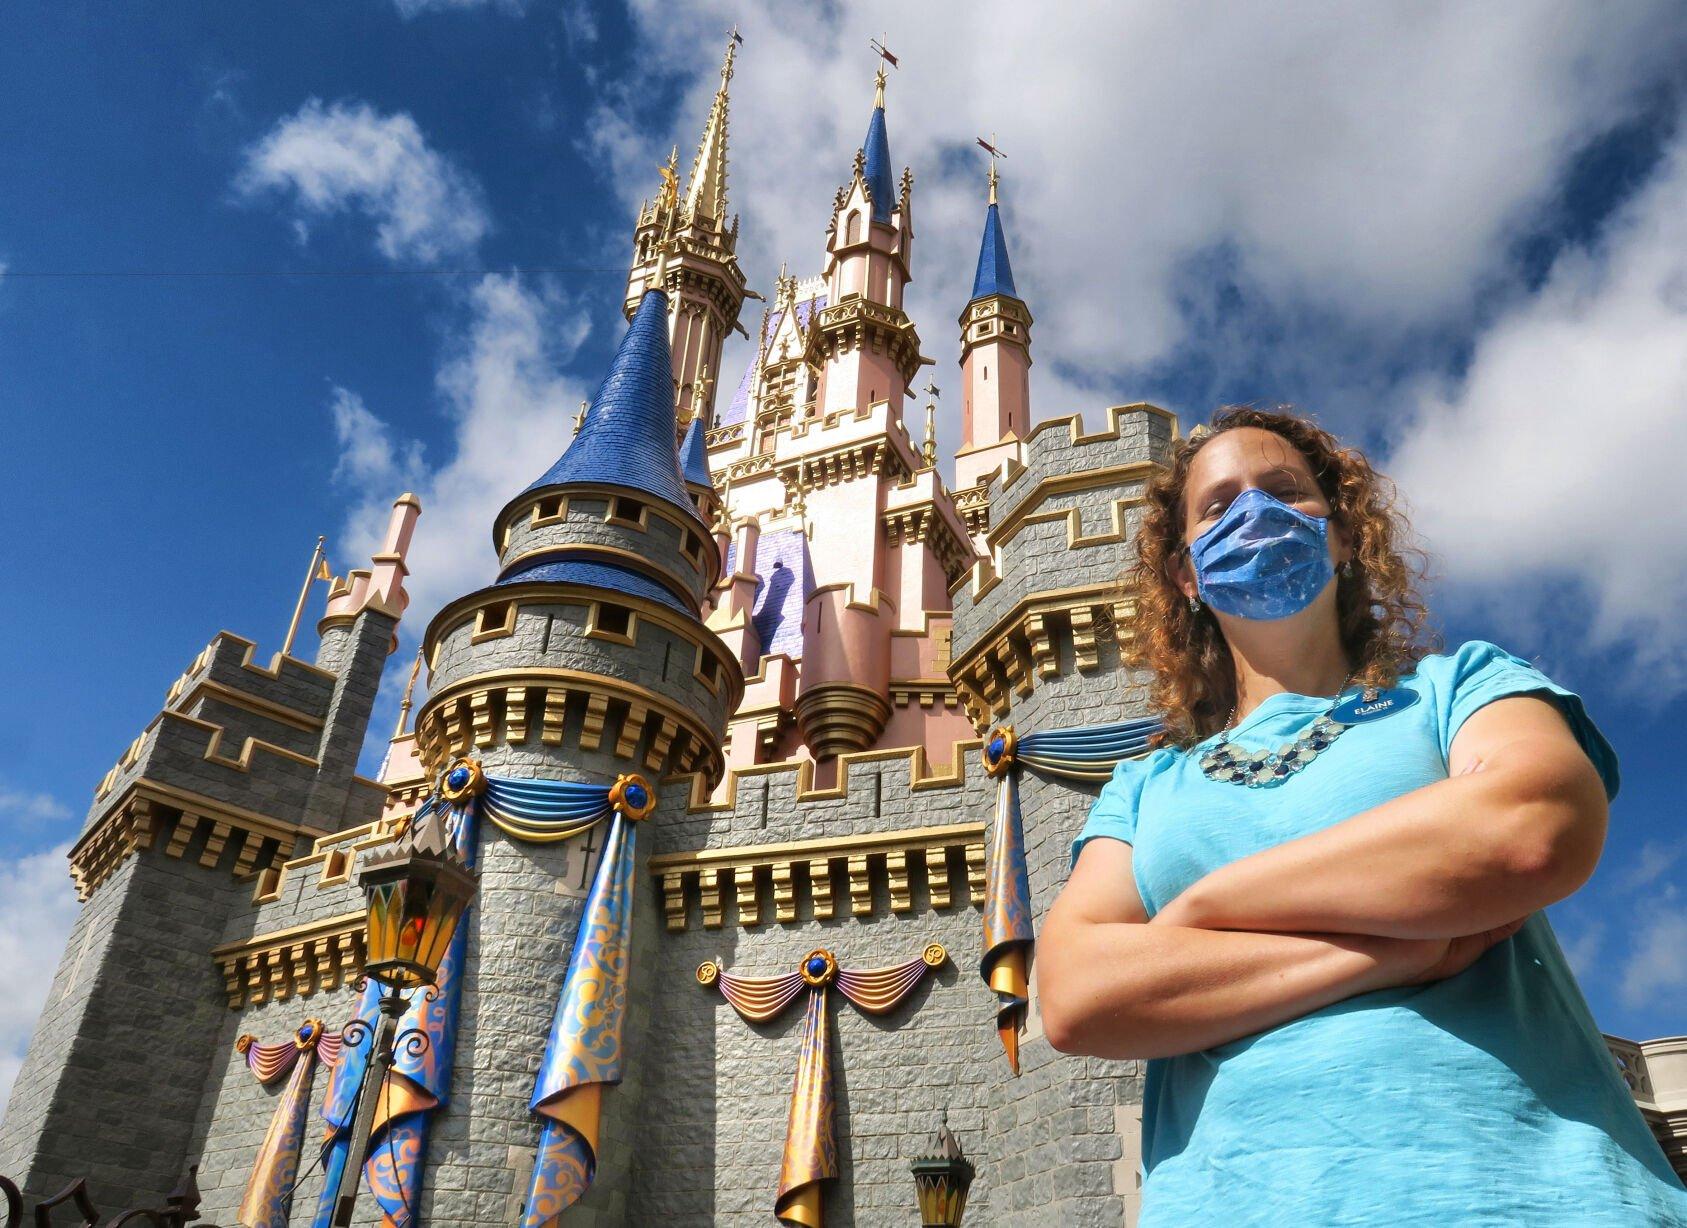 Disney World at 50: The making of Cinderella Castles makeover